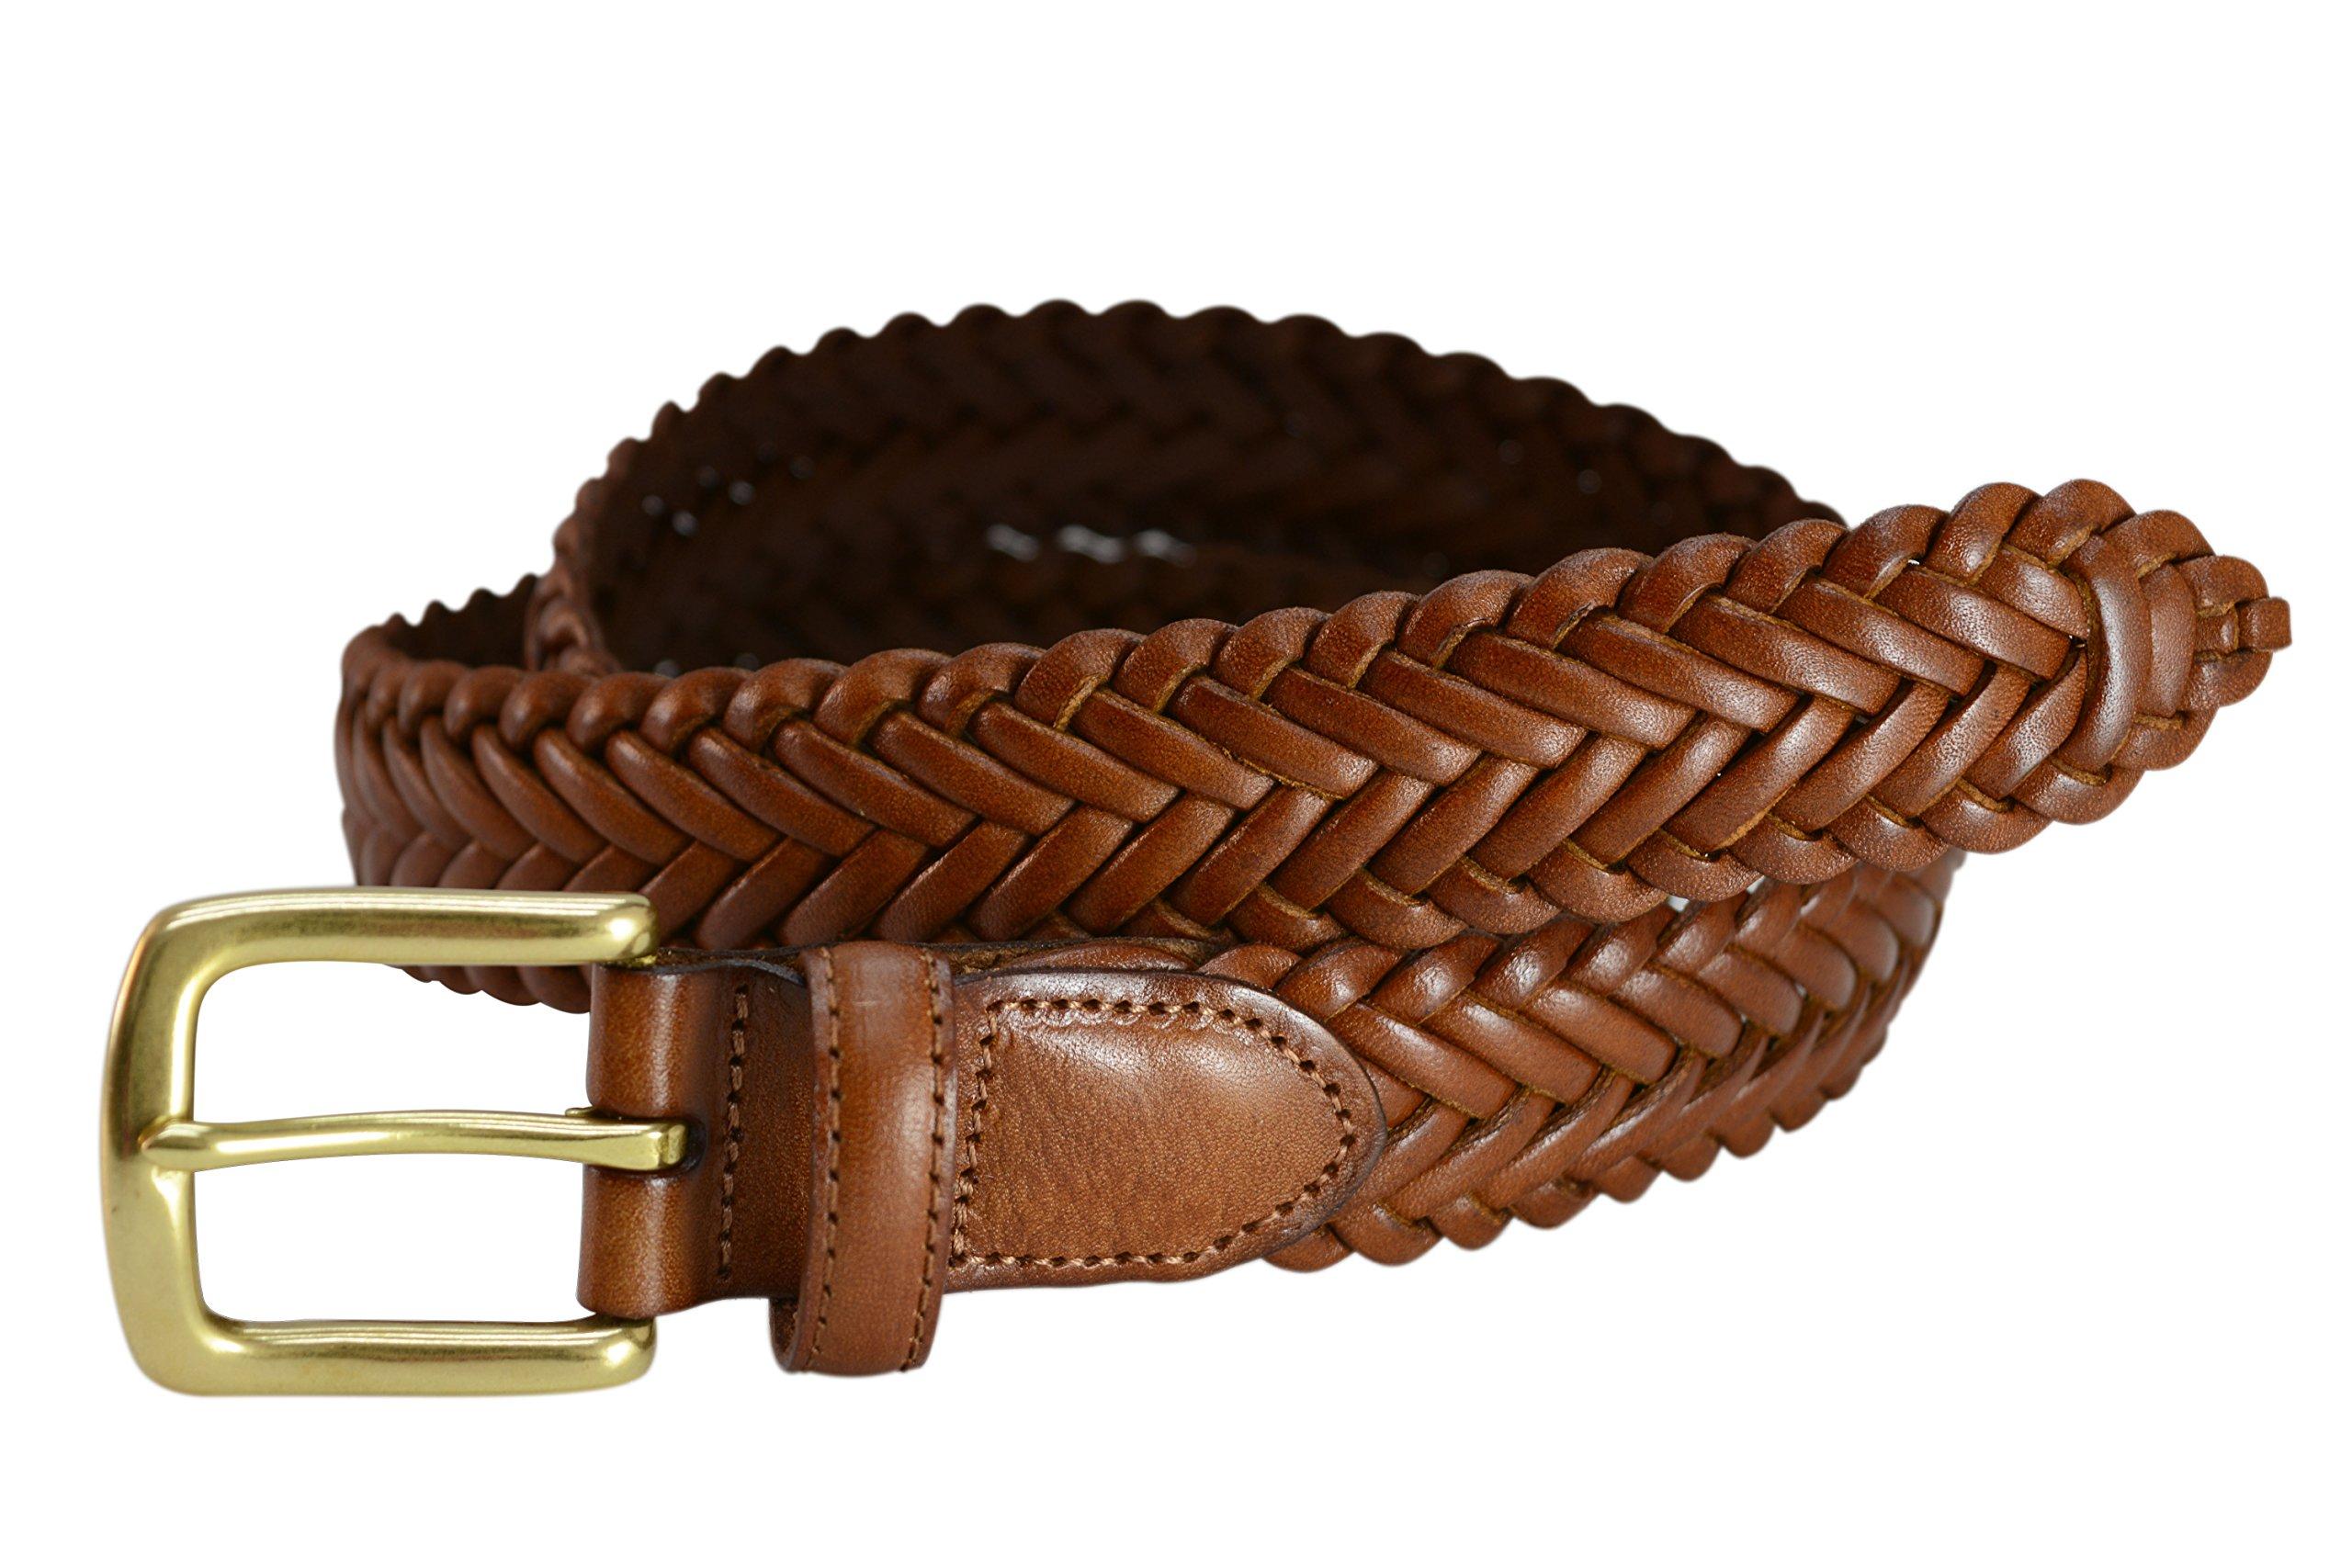 796-TAN - Toneka Men's Woven Tan Caramel Full grain Braided Leather Dress Belt (48)